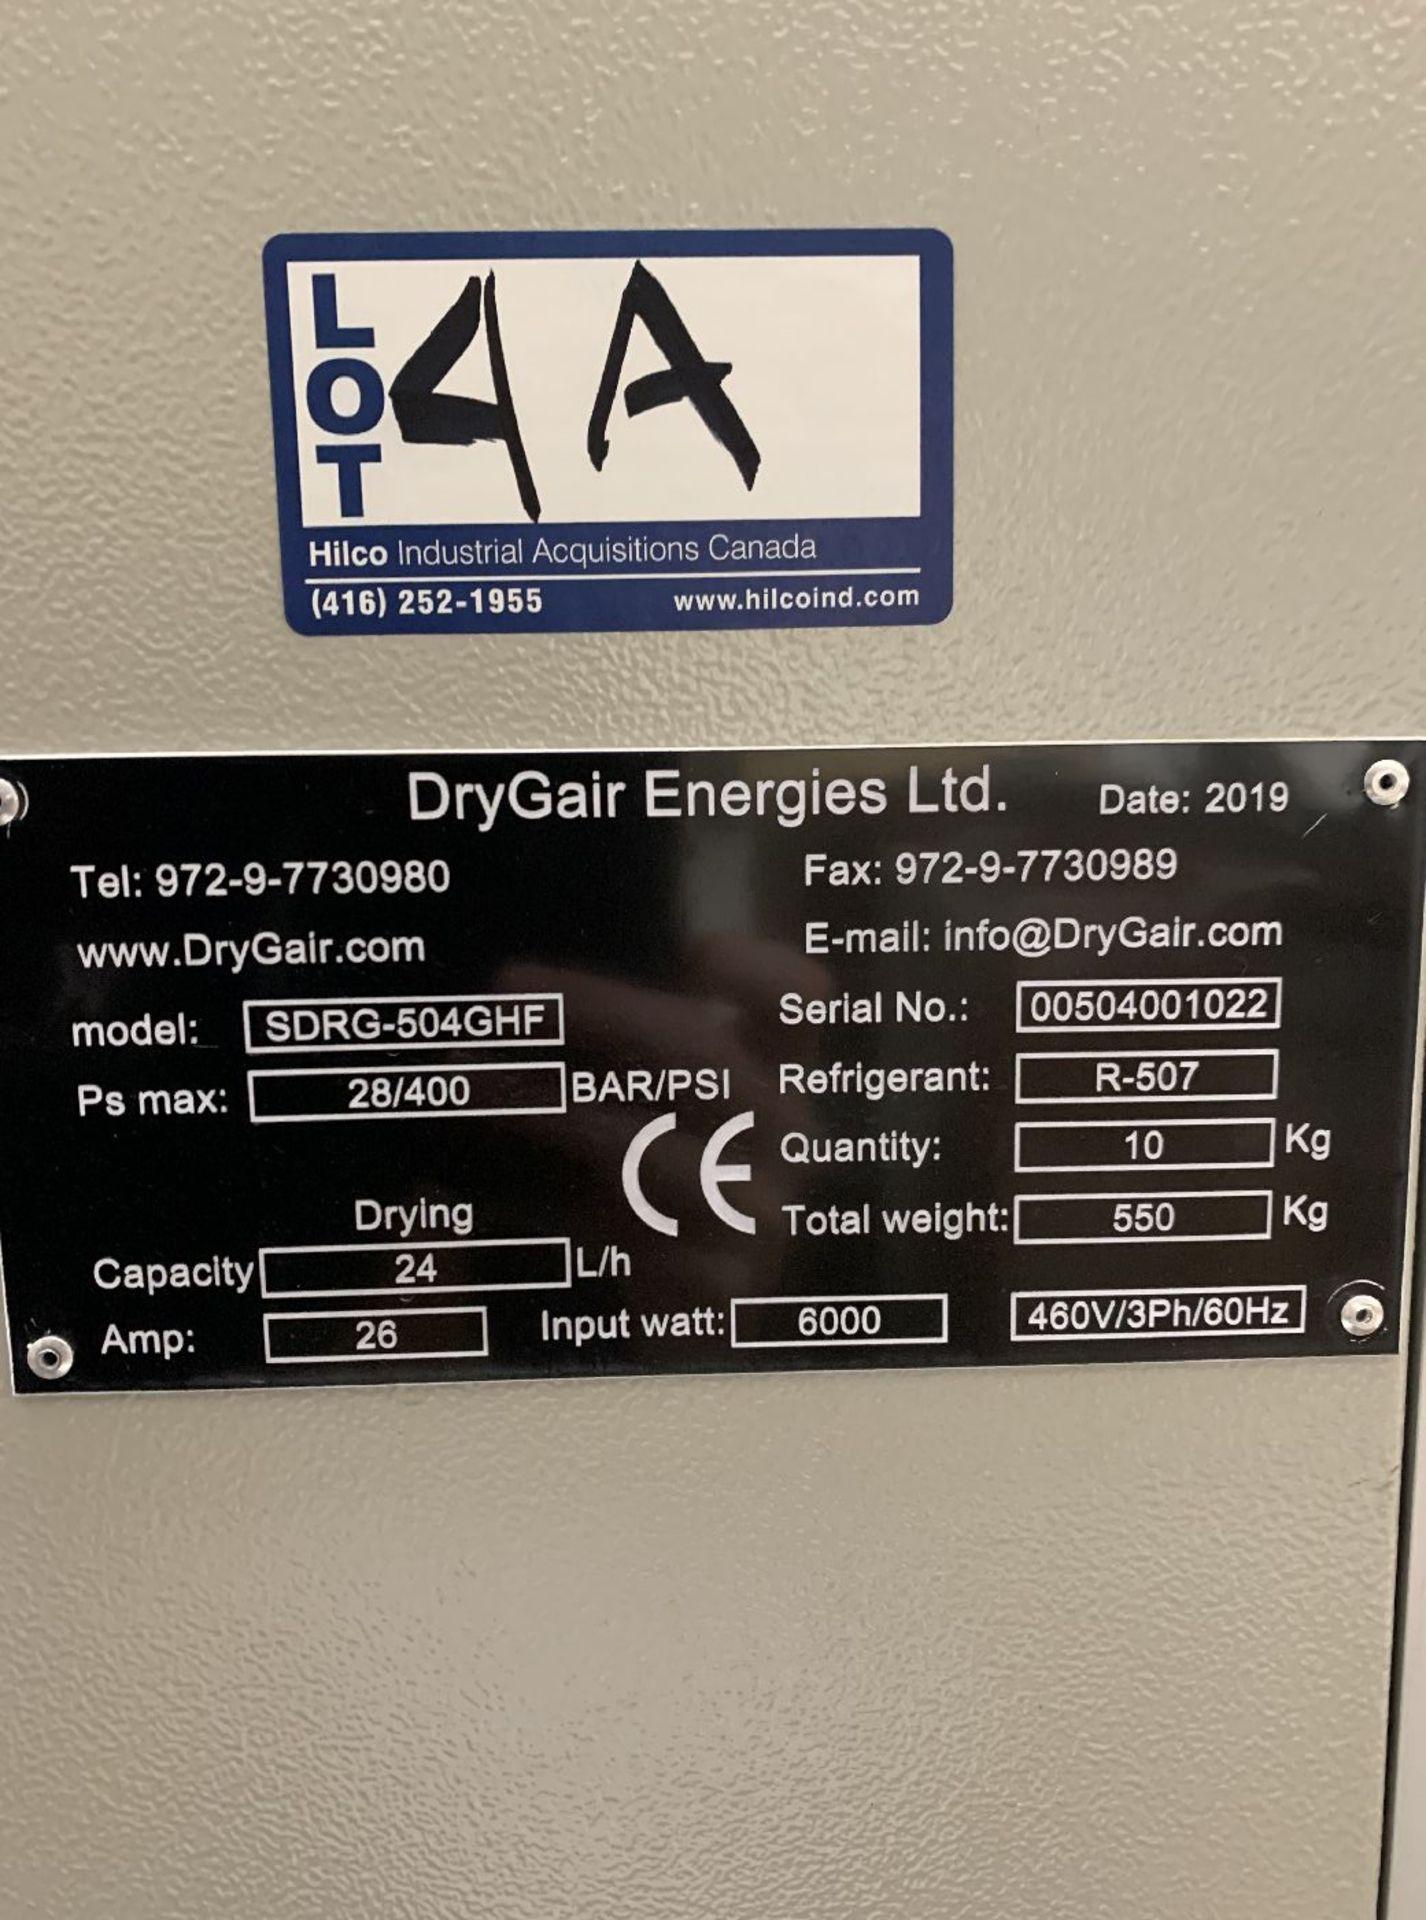 DryGair SDRG-504GHF Dehumidifier - Image 2 of 2